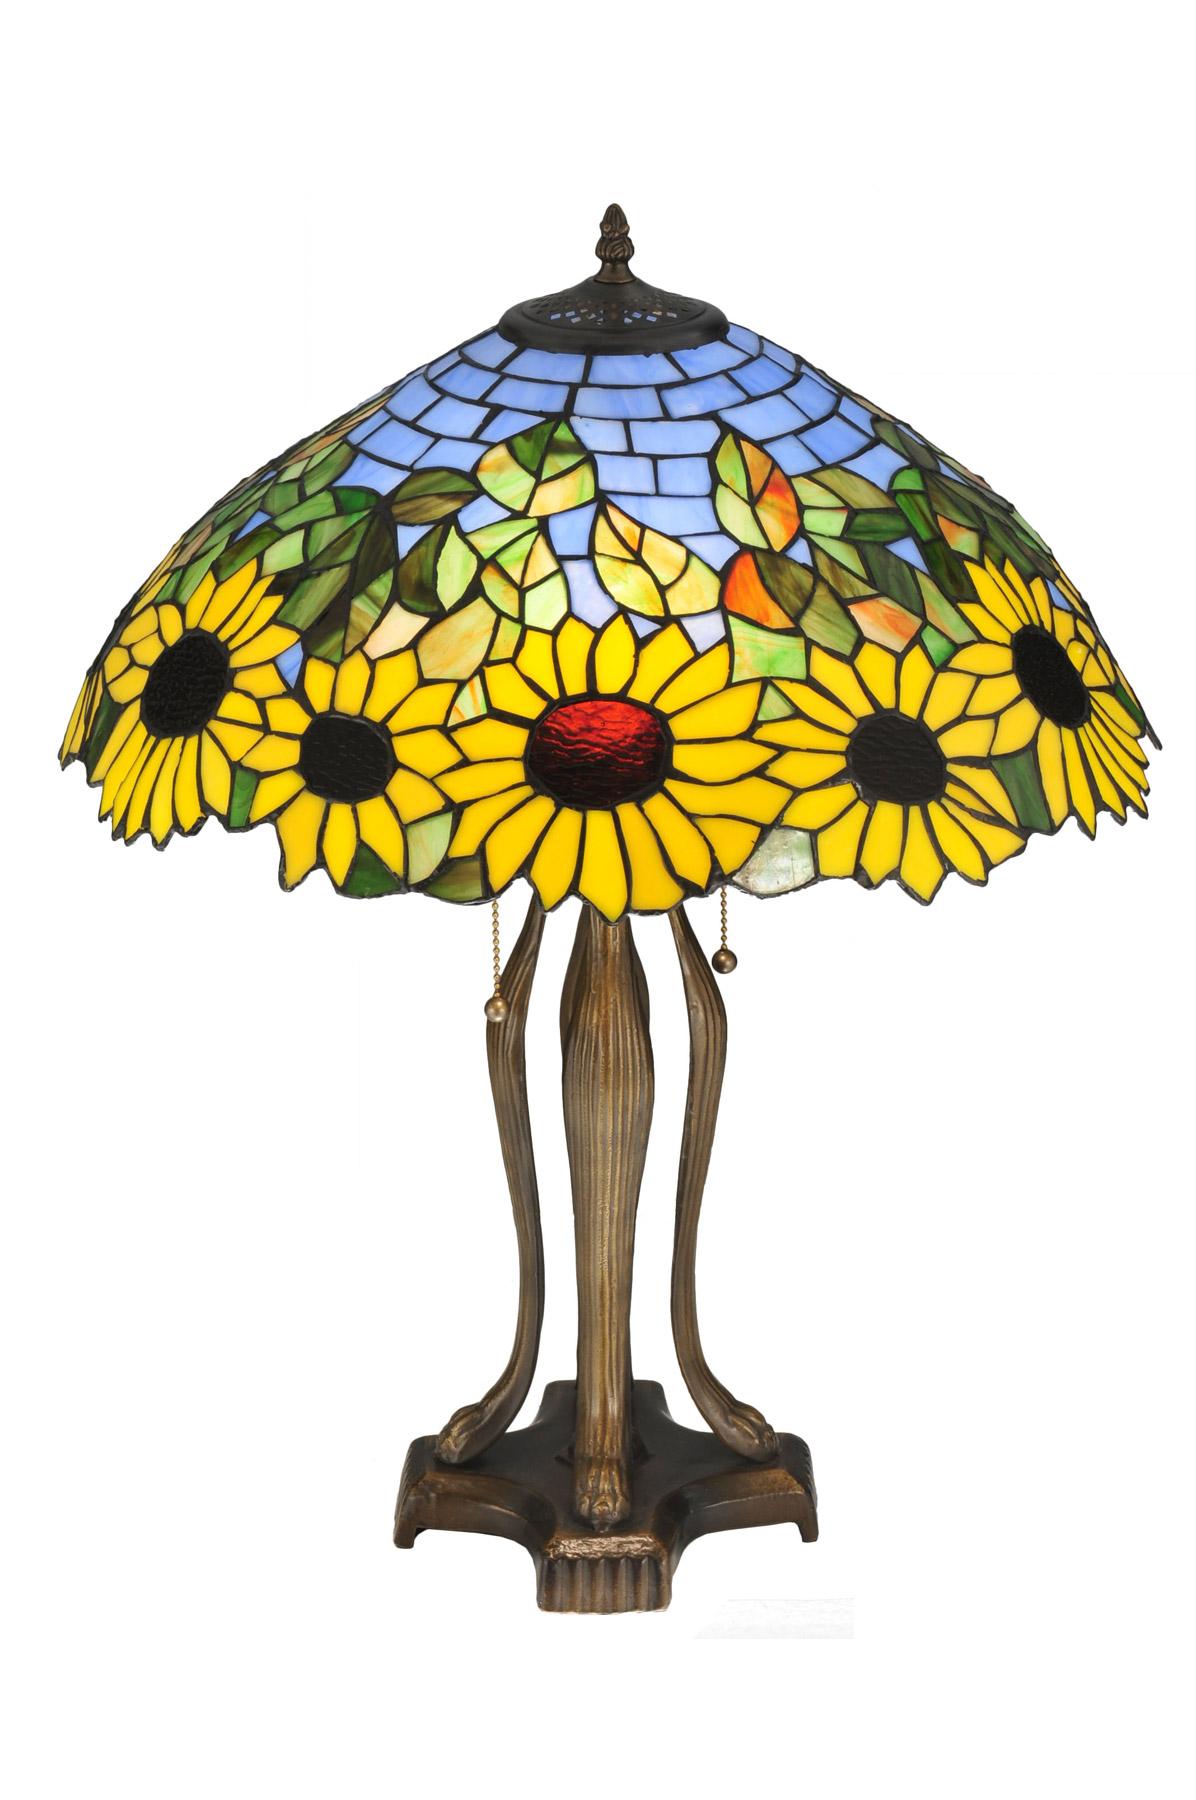 Meyda 119682 Sunflower Wild Table Lamp